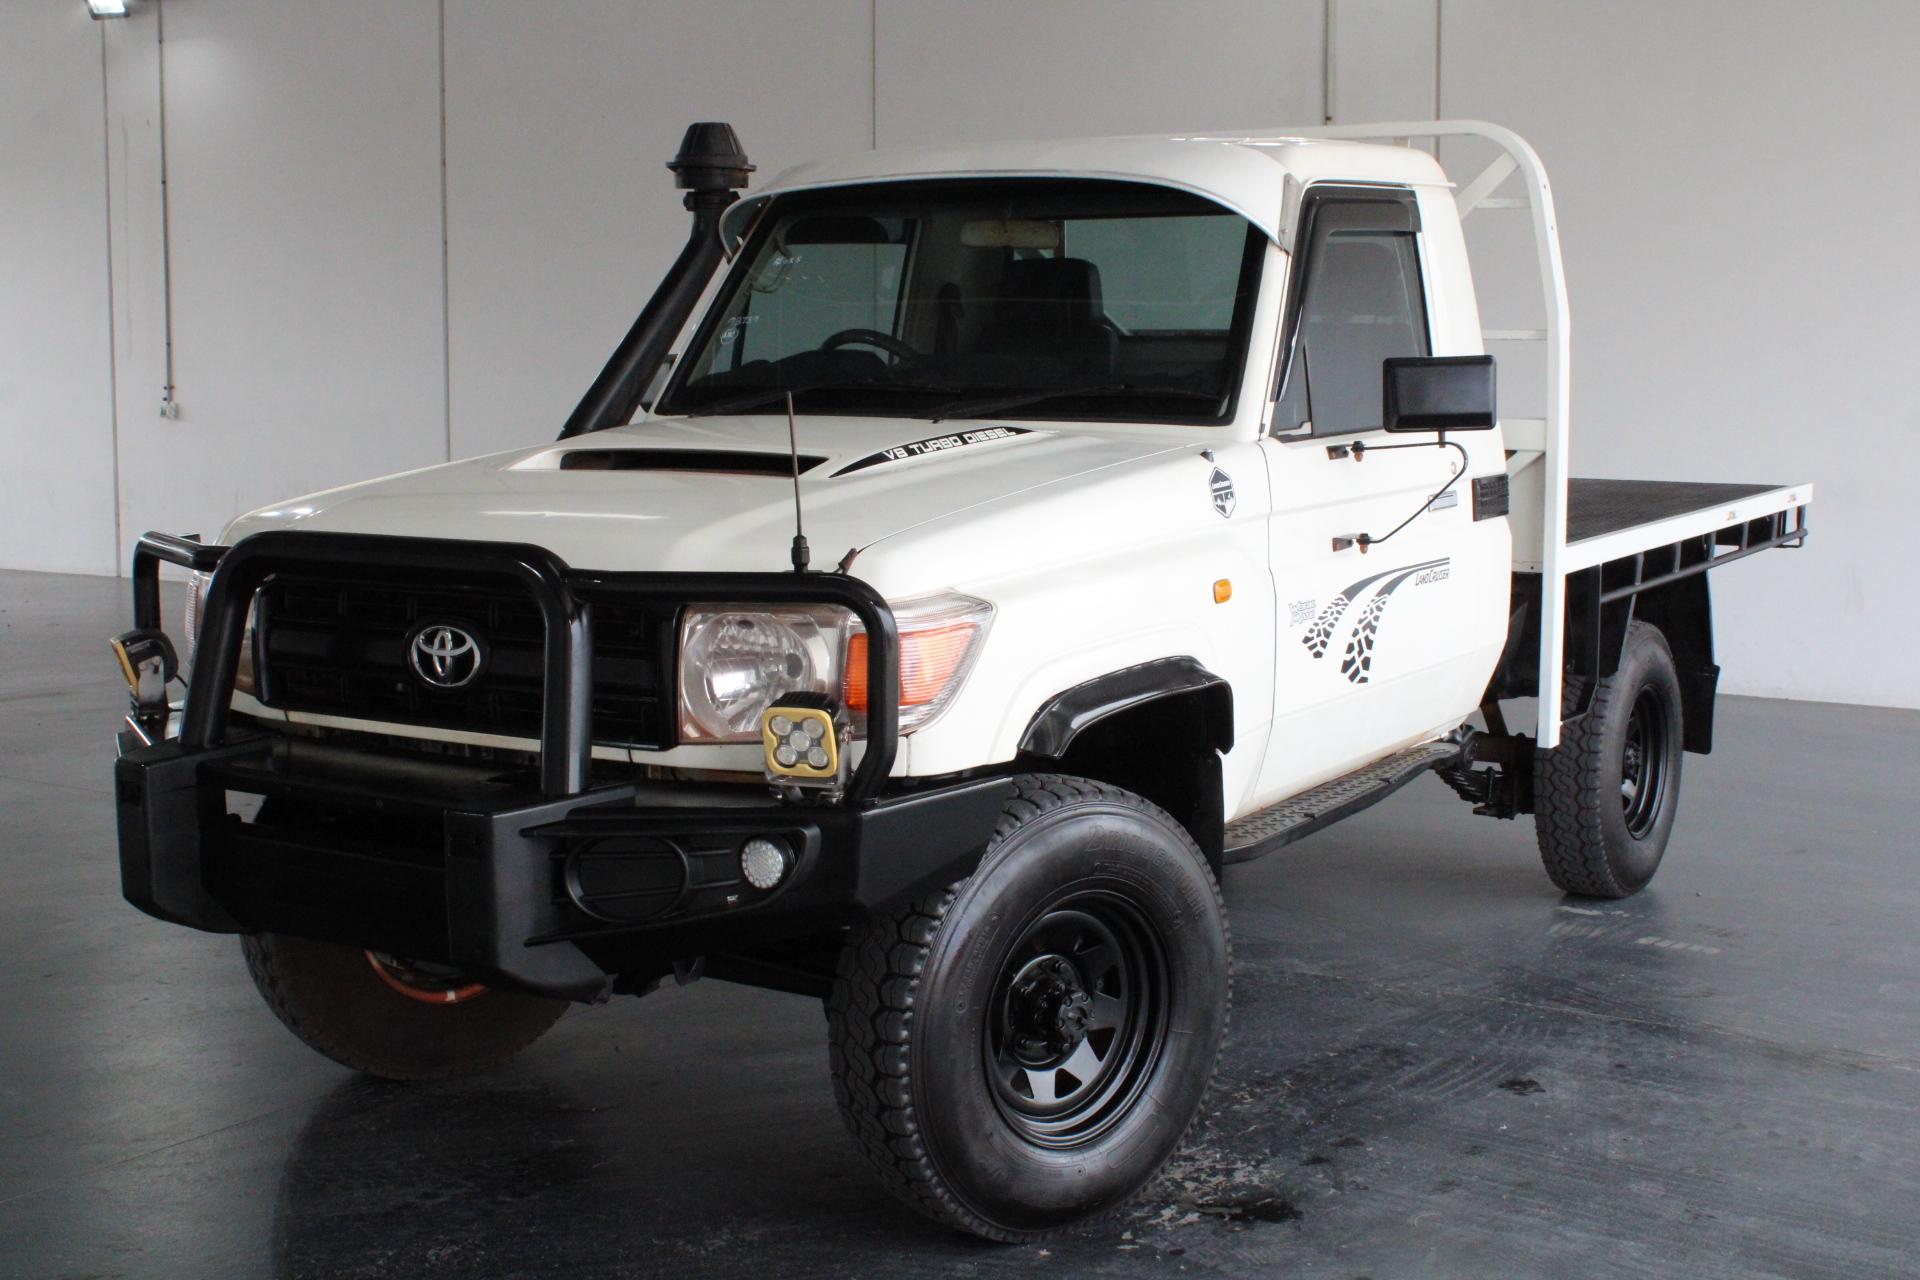 2011 Toyota Landcruiser Turbo Diesel Manual Ute